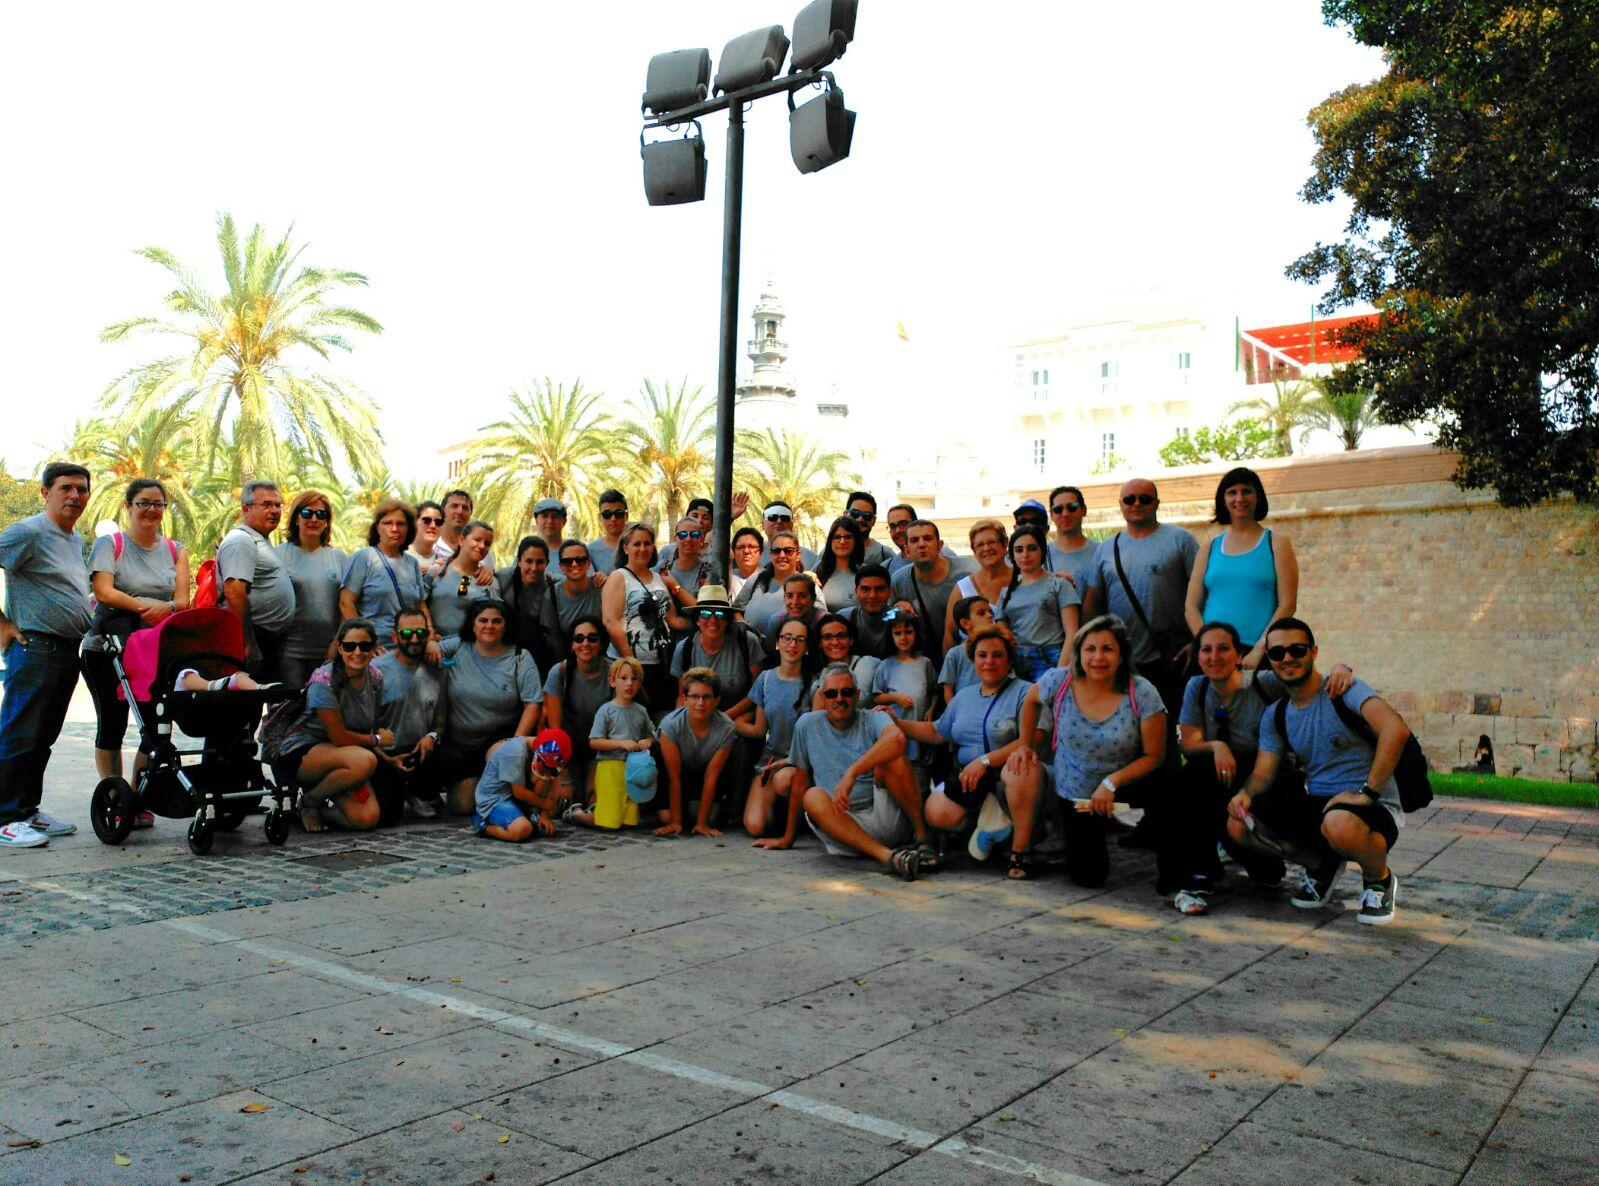 La Palma (Cartagena - Murcia)